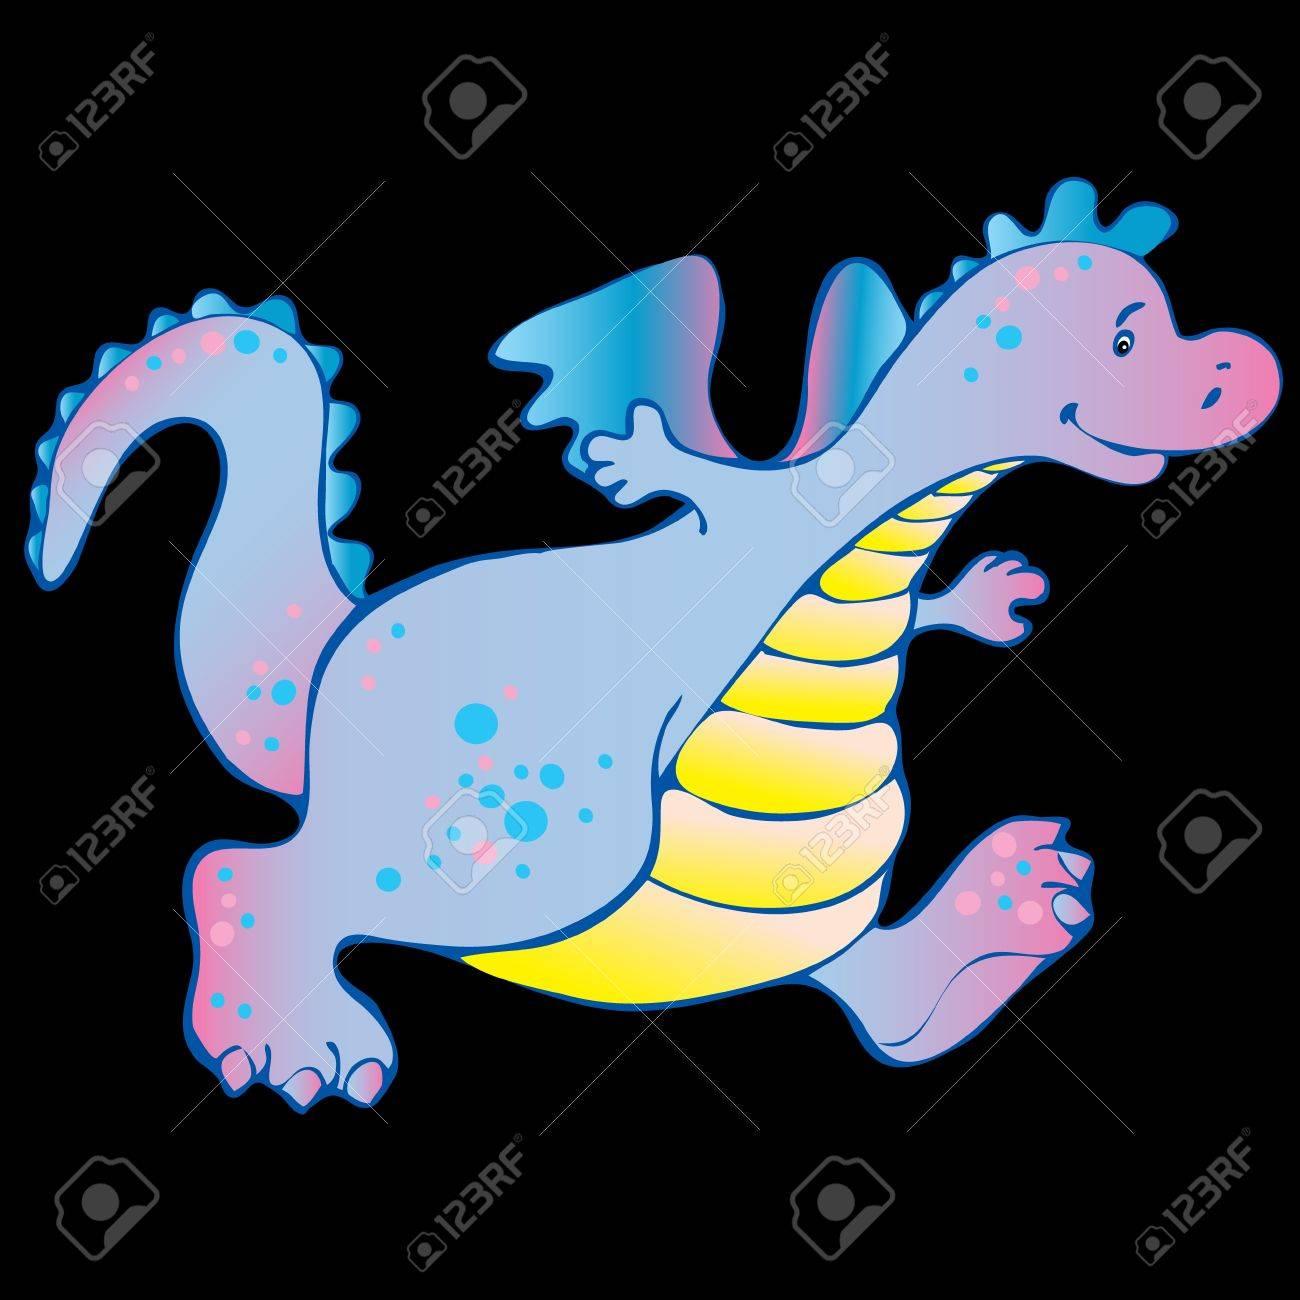 Baby dragon. Vector art-illustration on a black background. Stock Vector - 11597797